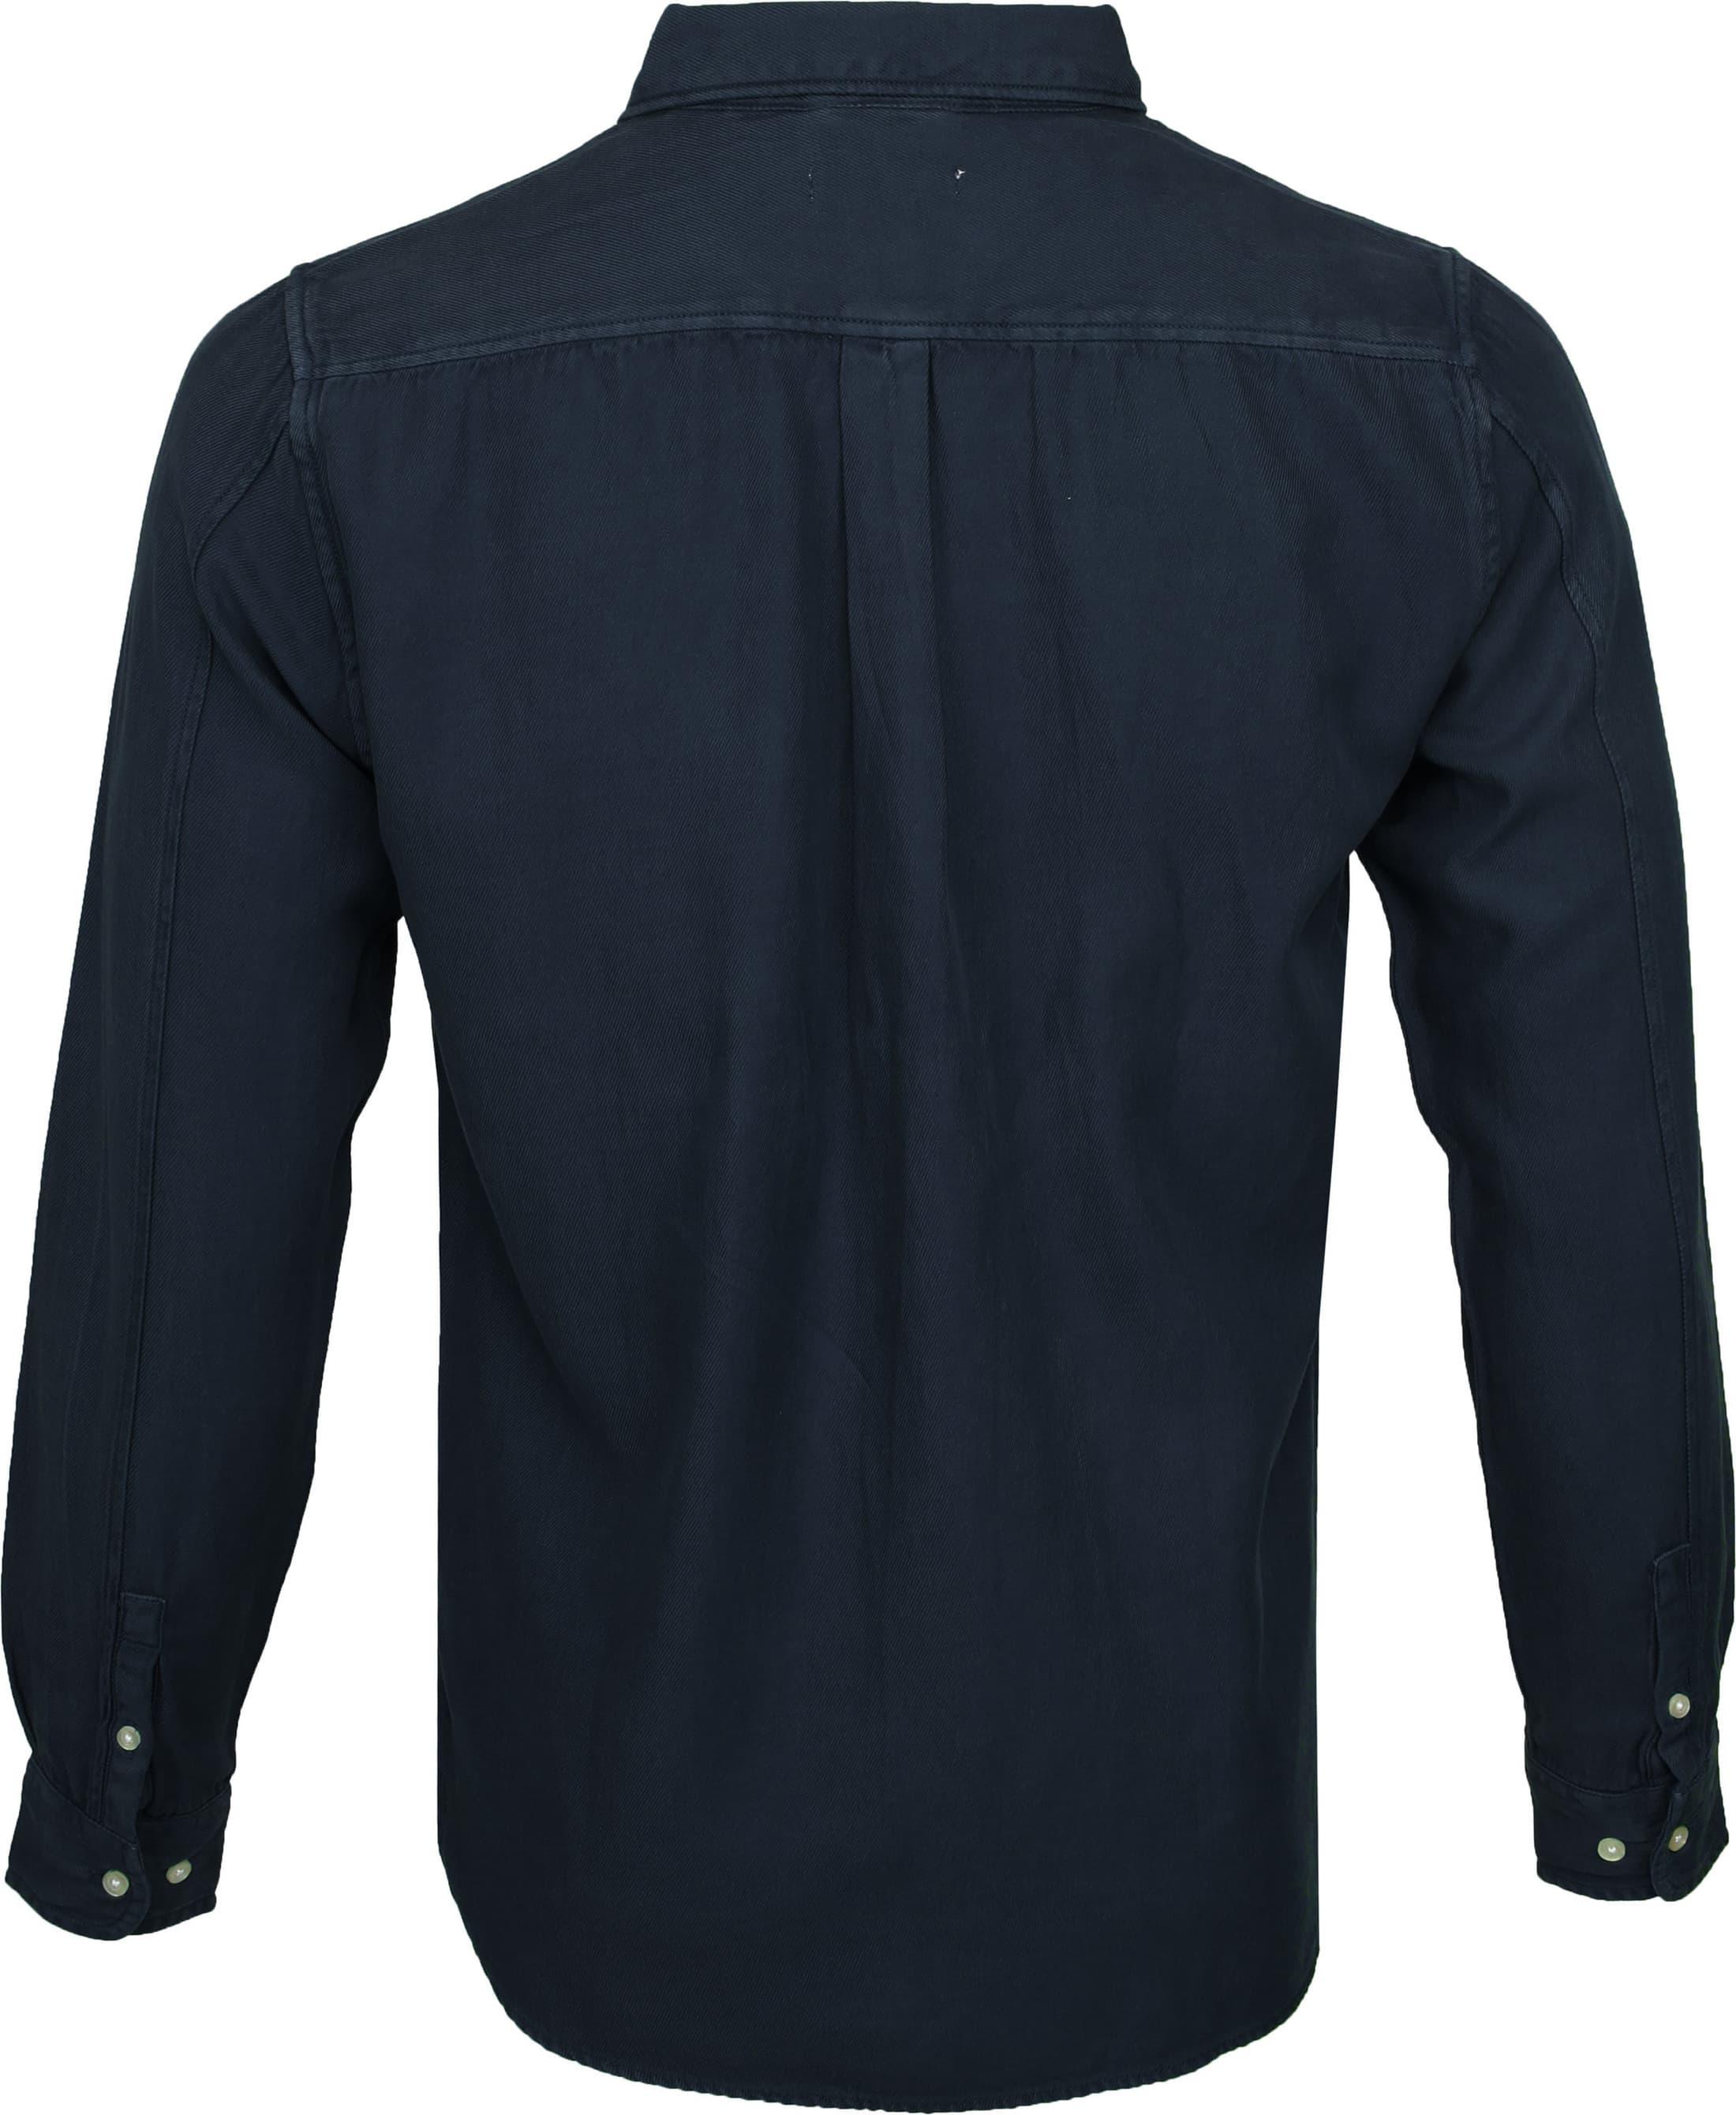 KnowledgeCotton Apparel Overhemd Twill Navy foto 3